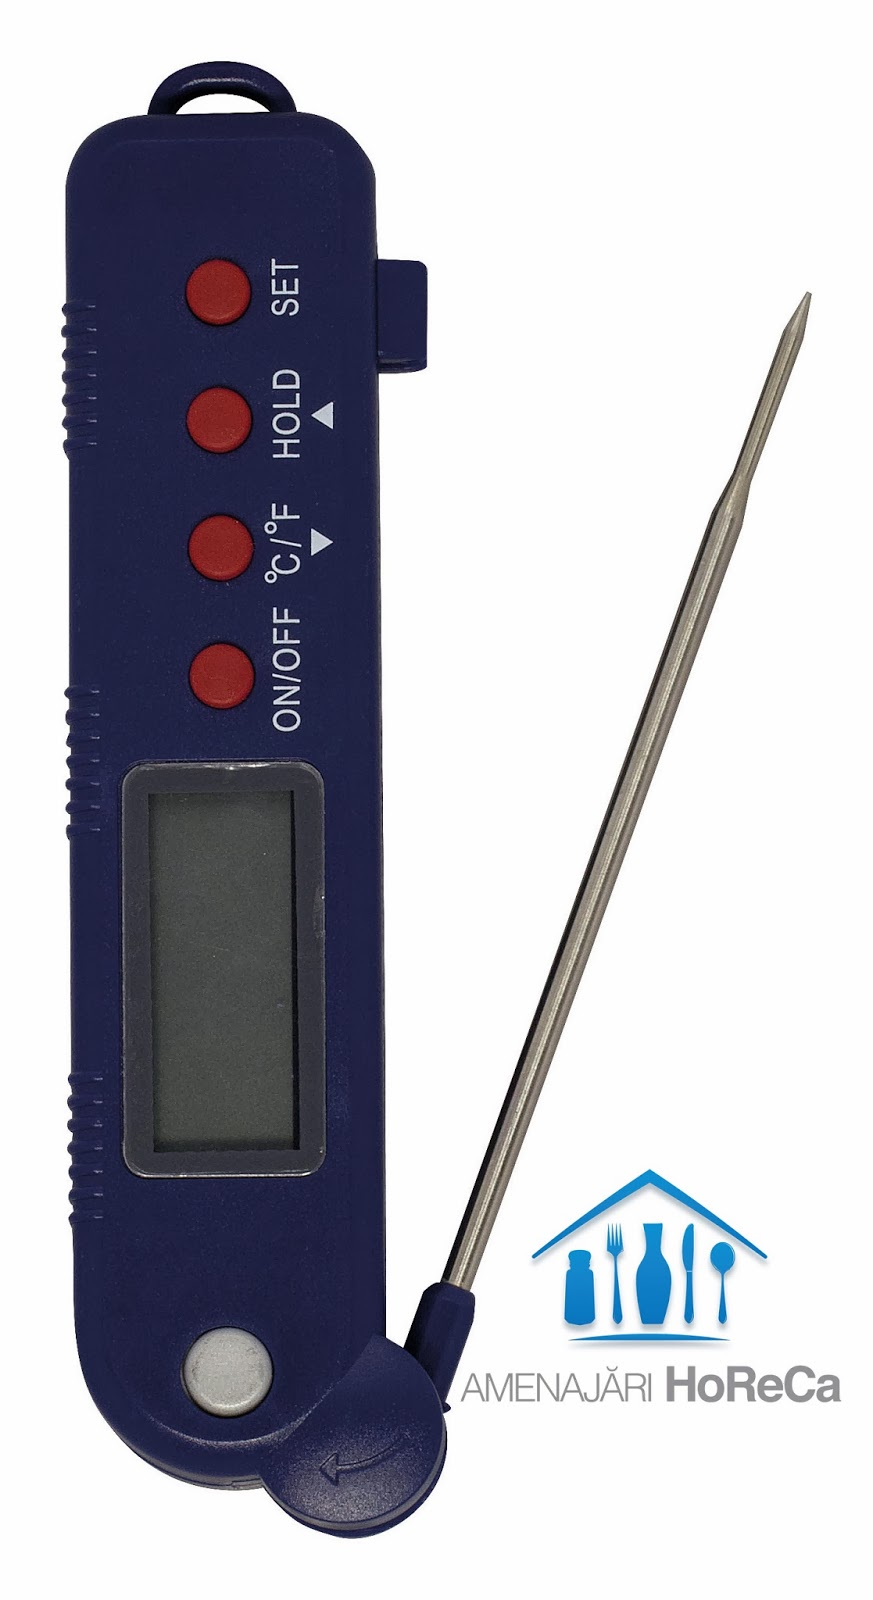 Termometru bucatarie cu sonda pliabila, Pret termometru profesional bucatarie